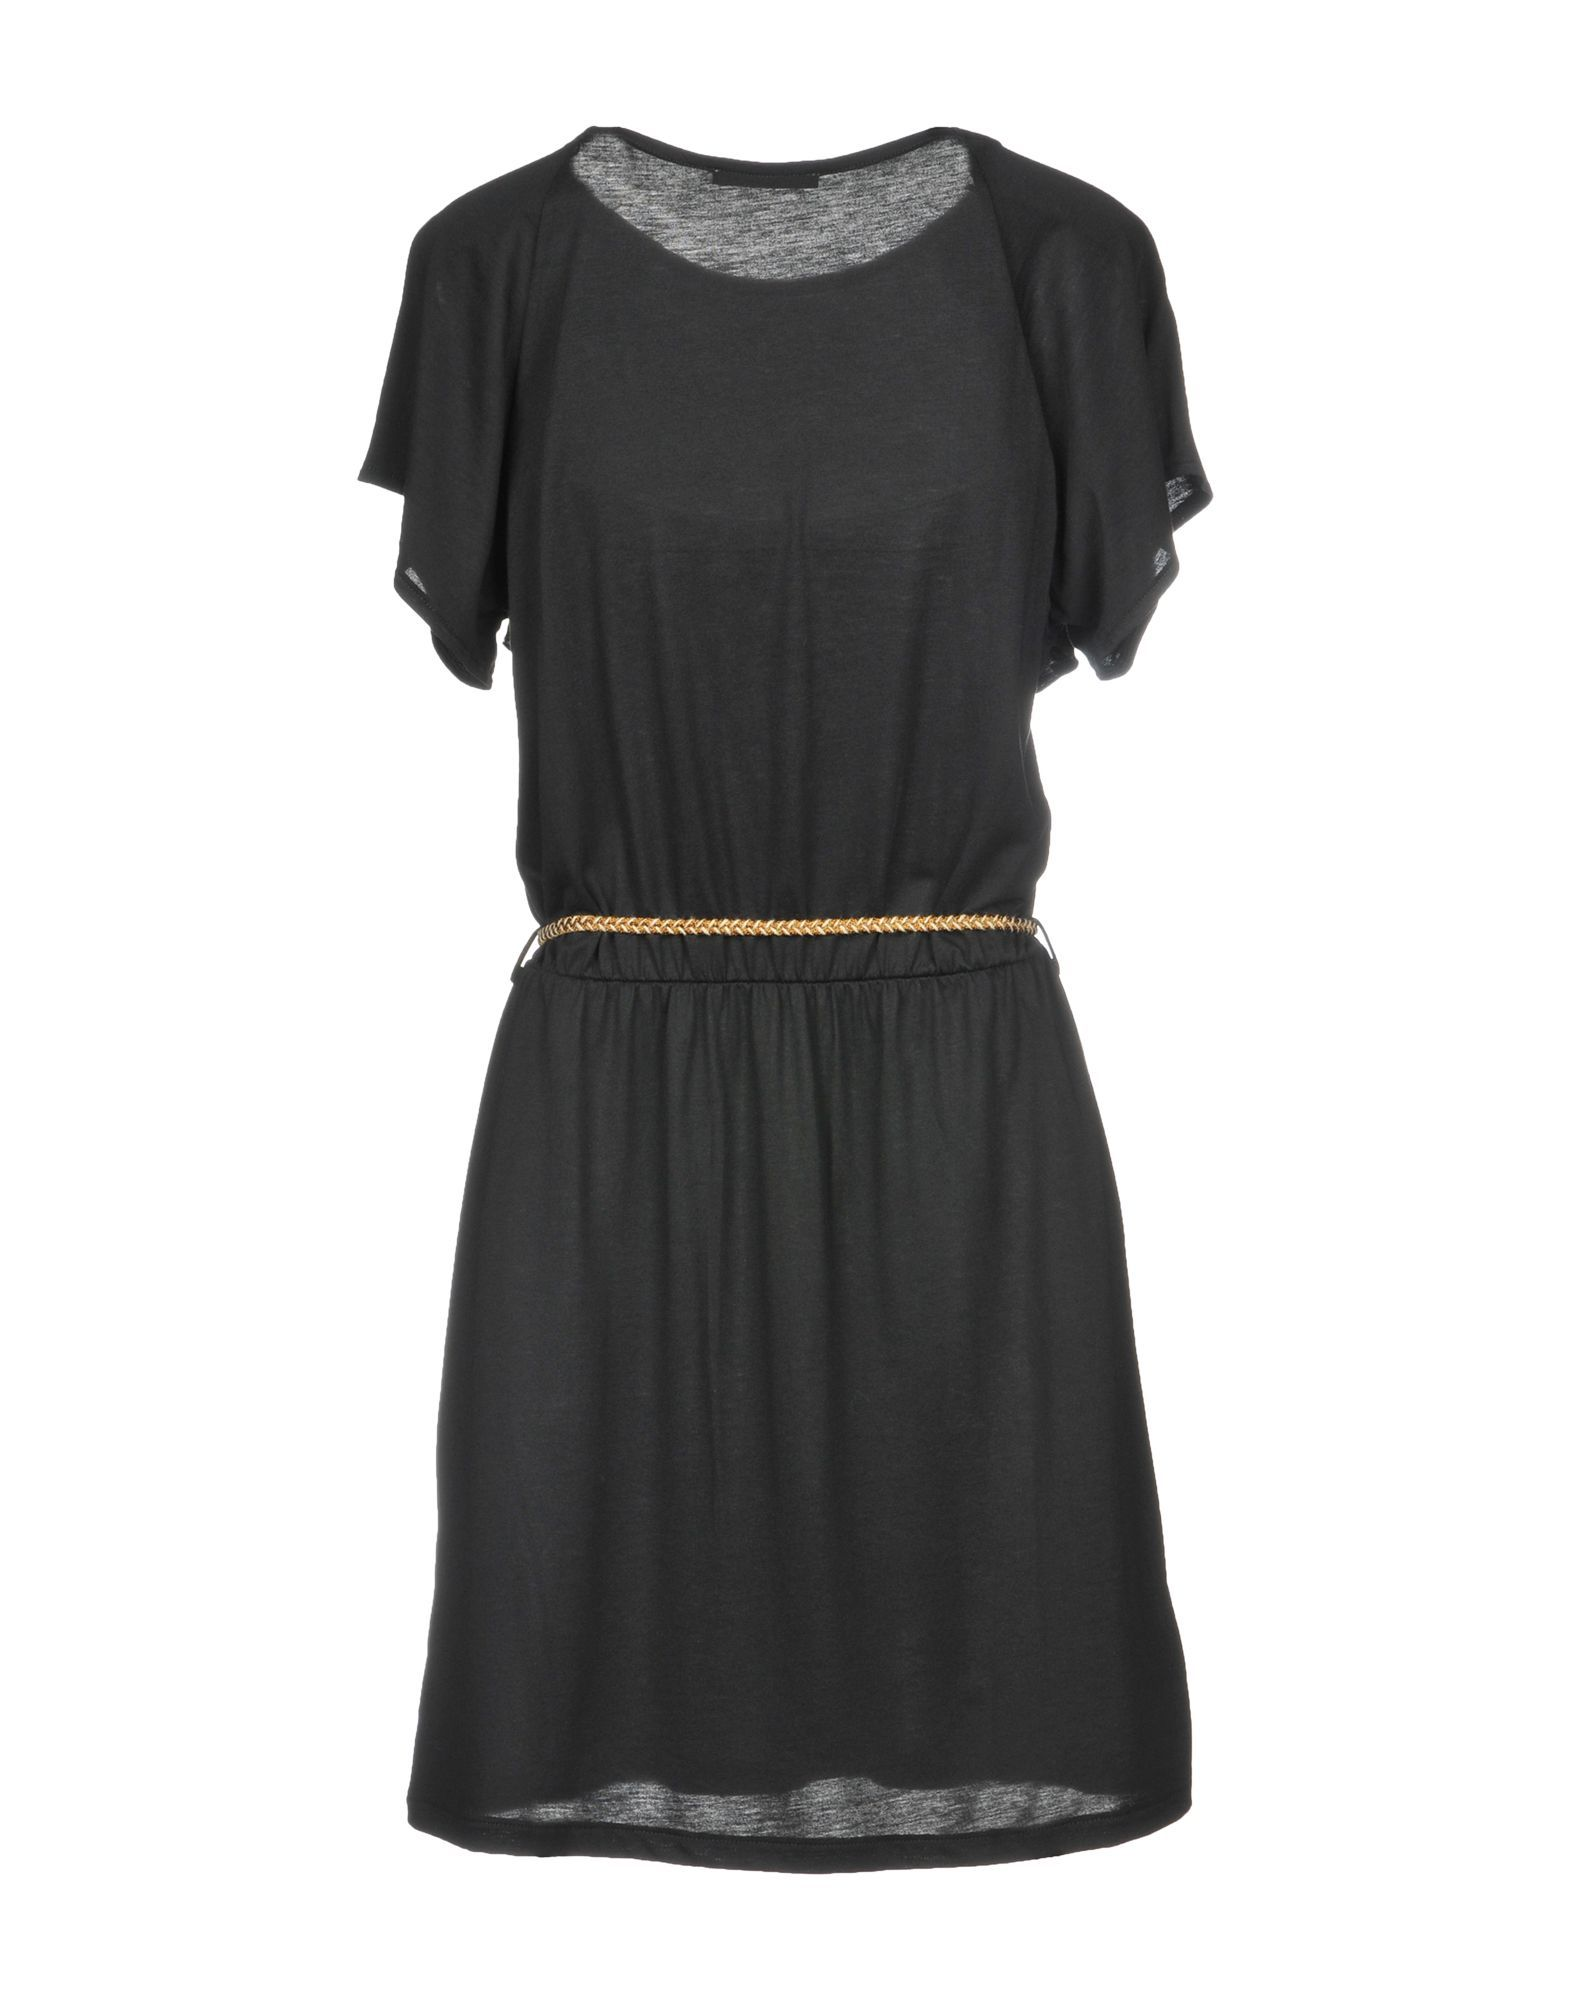 Sessun Black Short Sleeve Belted Dress